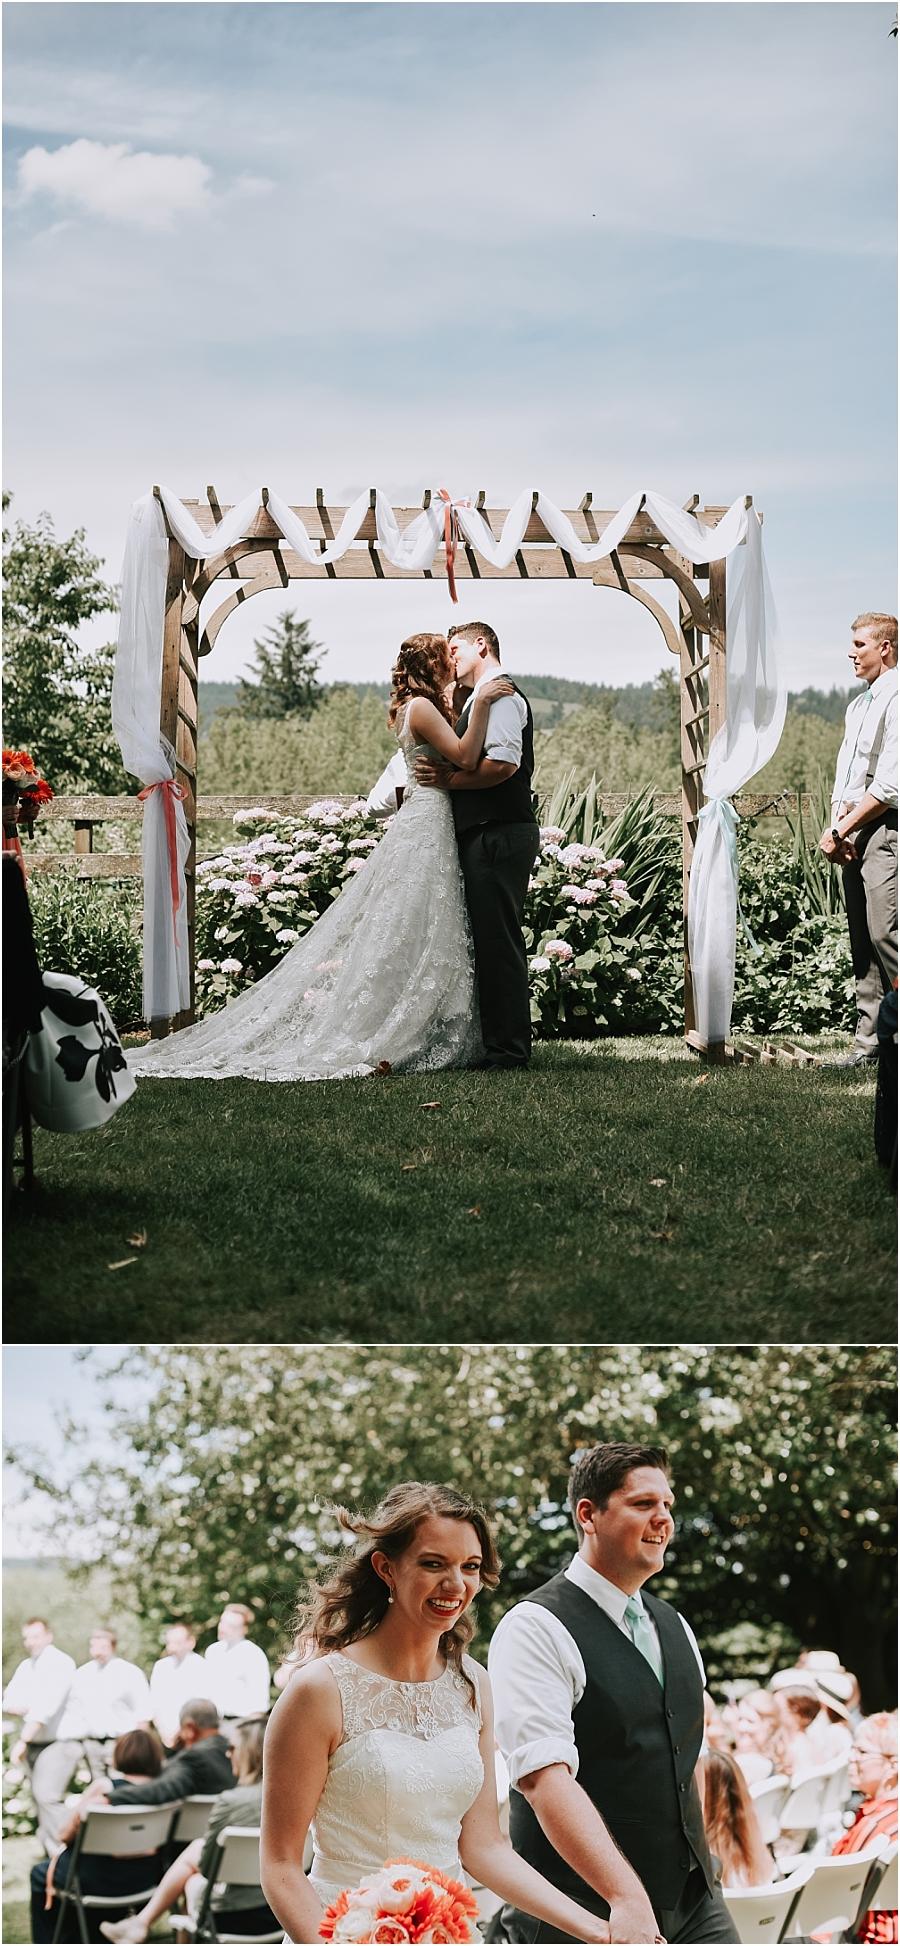 nbp-naylor-wedding_0007.jpg